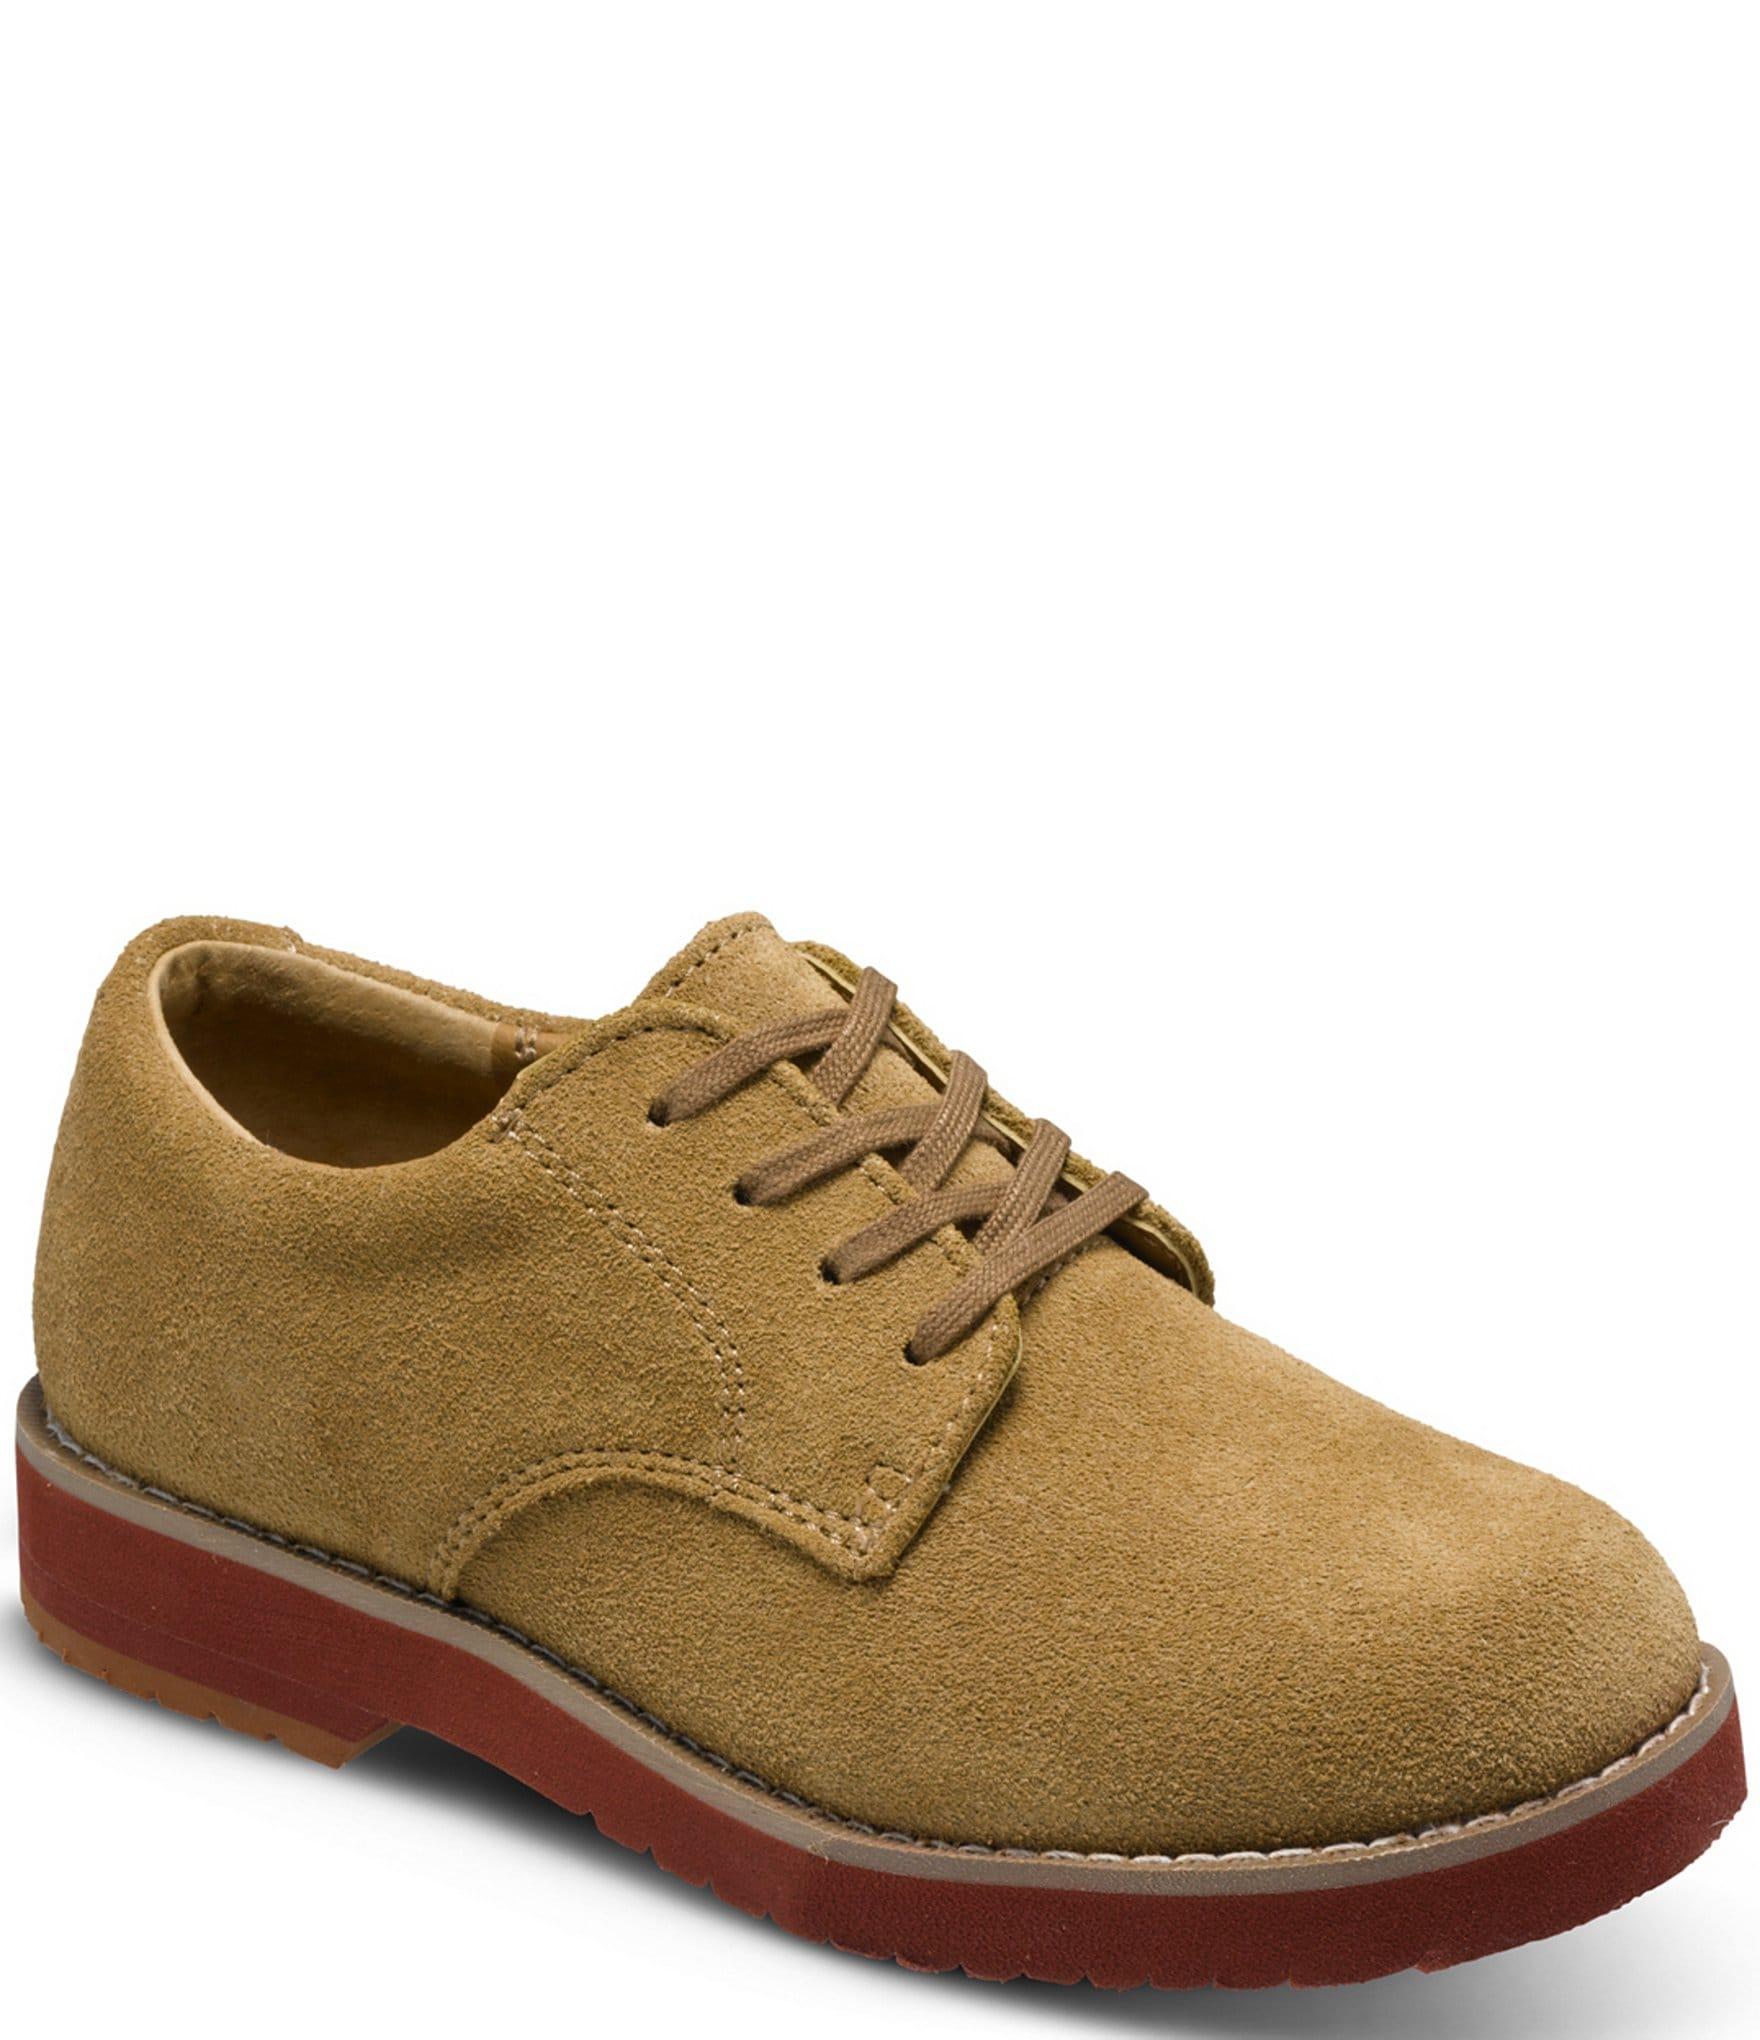 Top Sneaker Sperry Boys' Windward sider tsQdChr